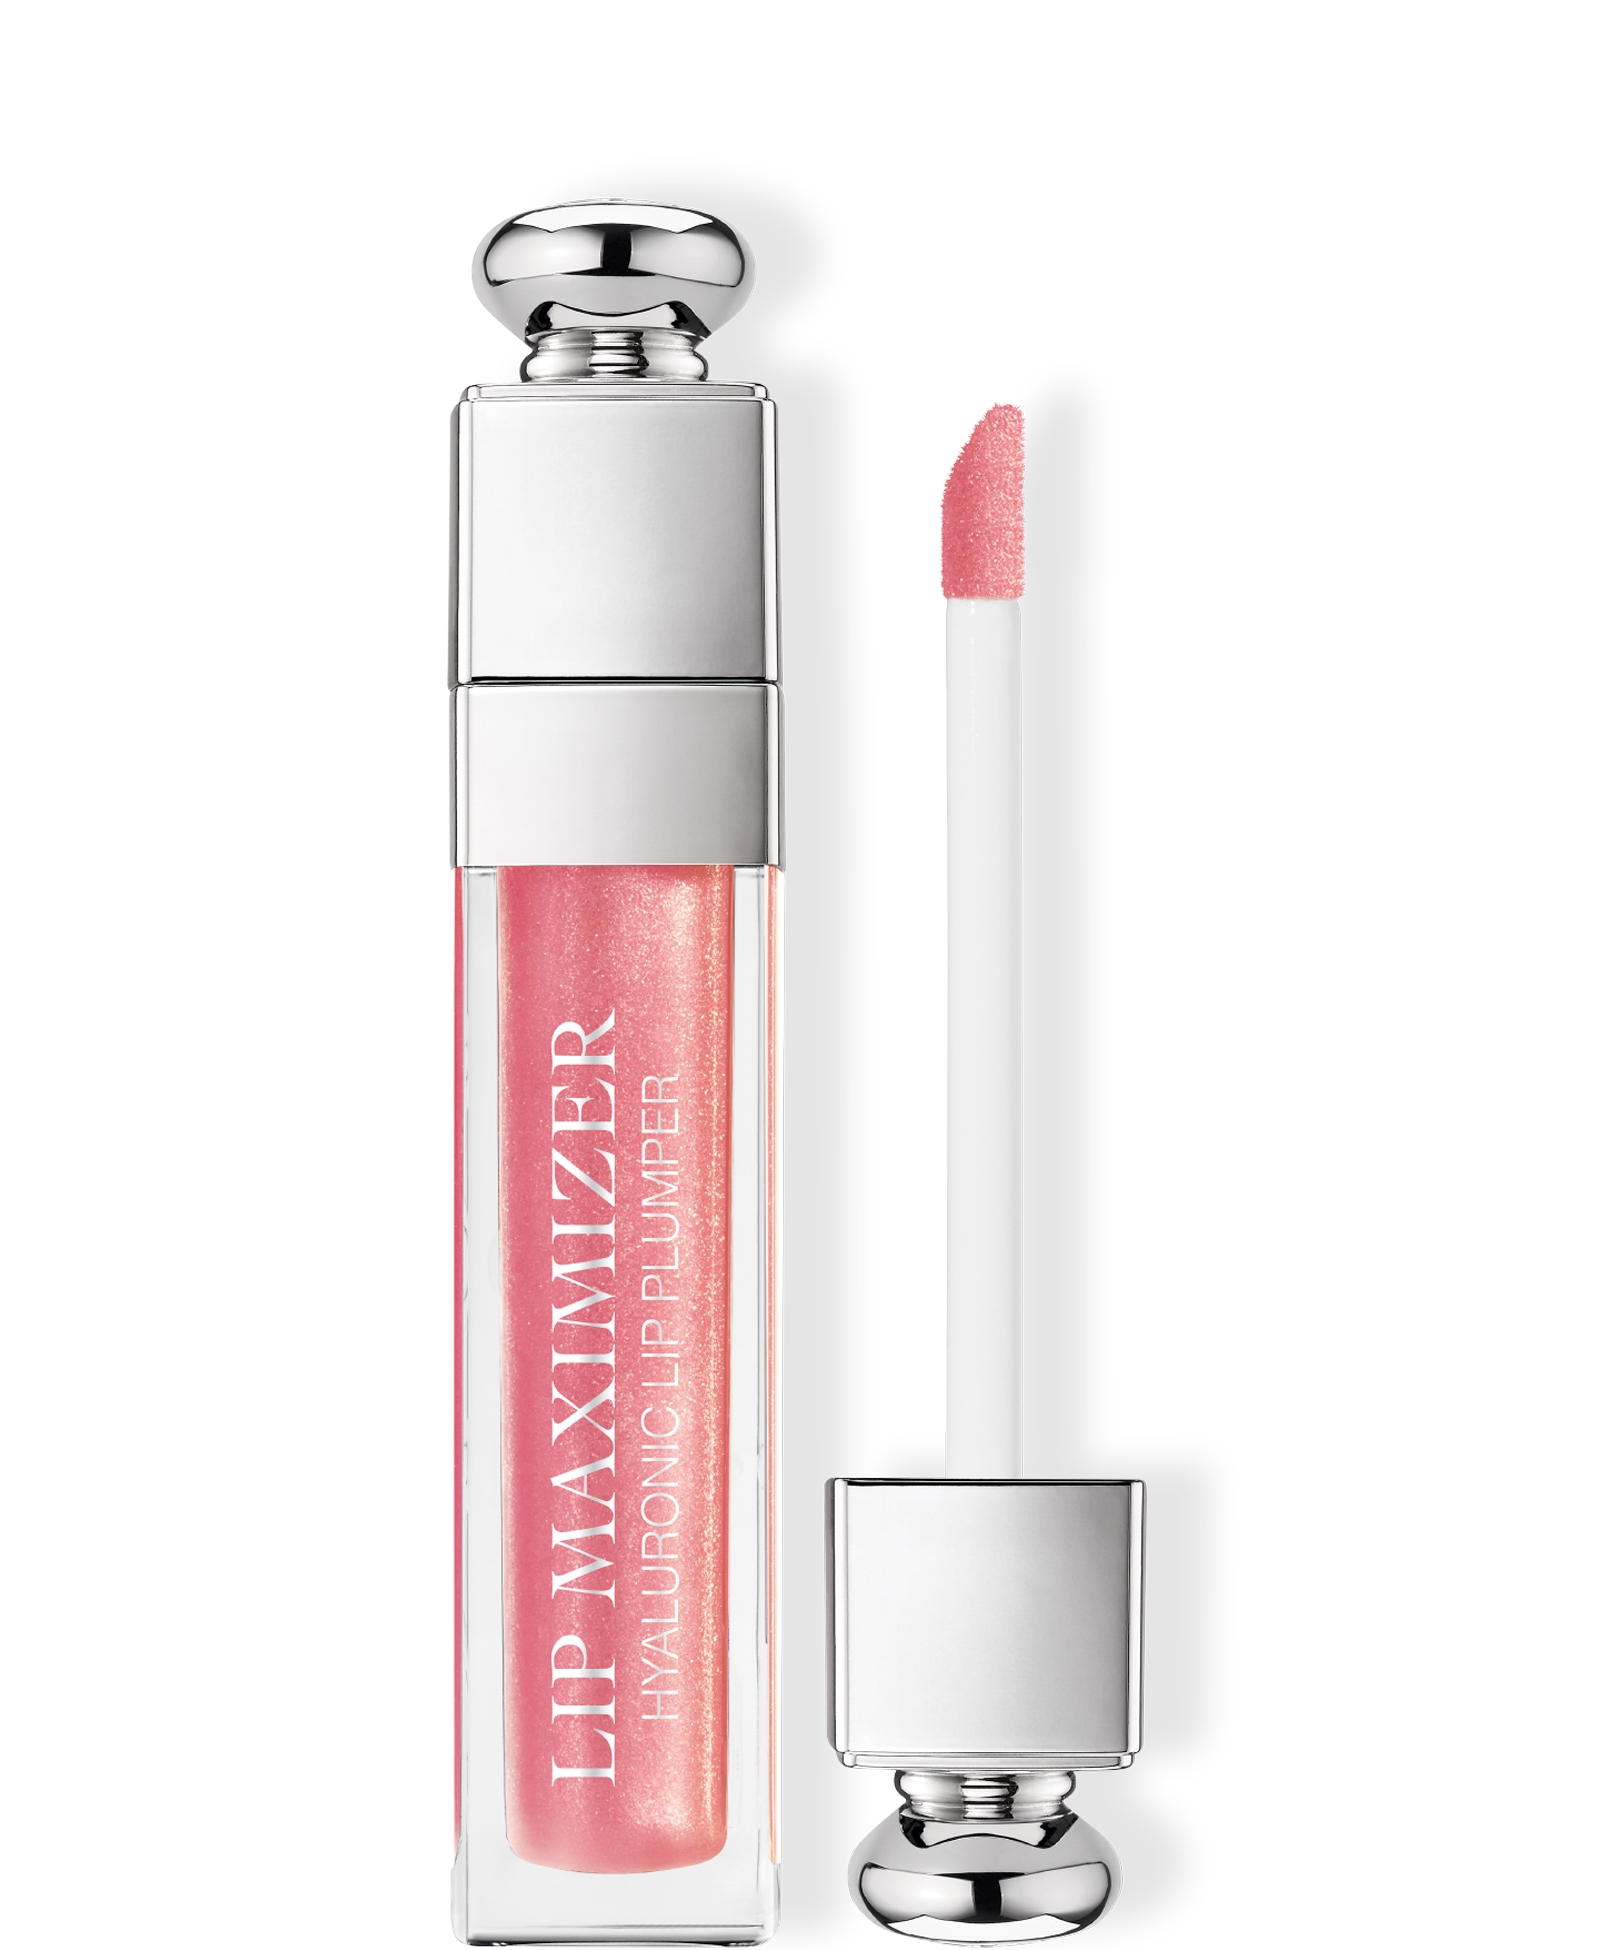 DIOR Addict Lip Maximizer, 010 Holo Pink